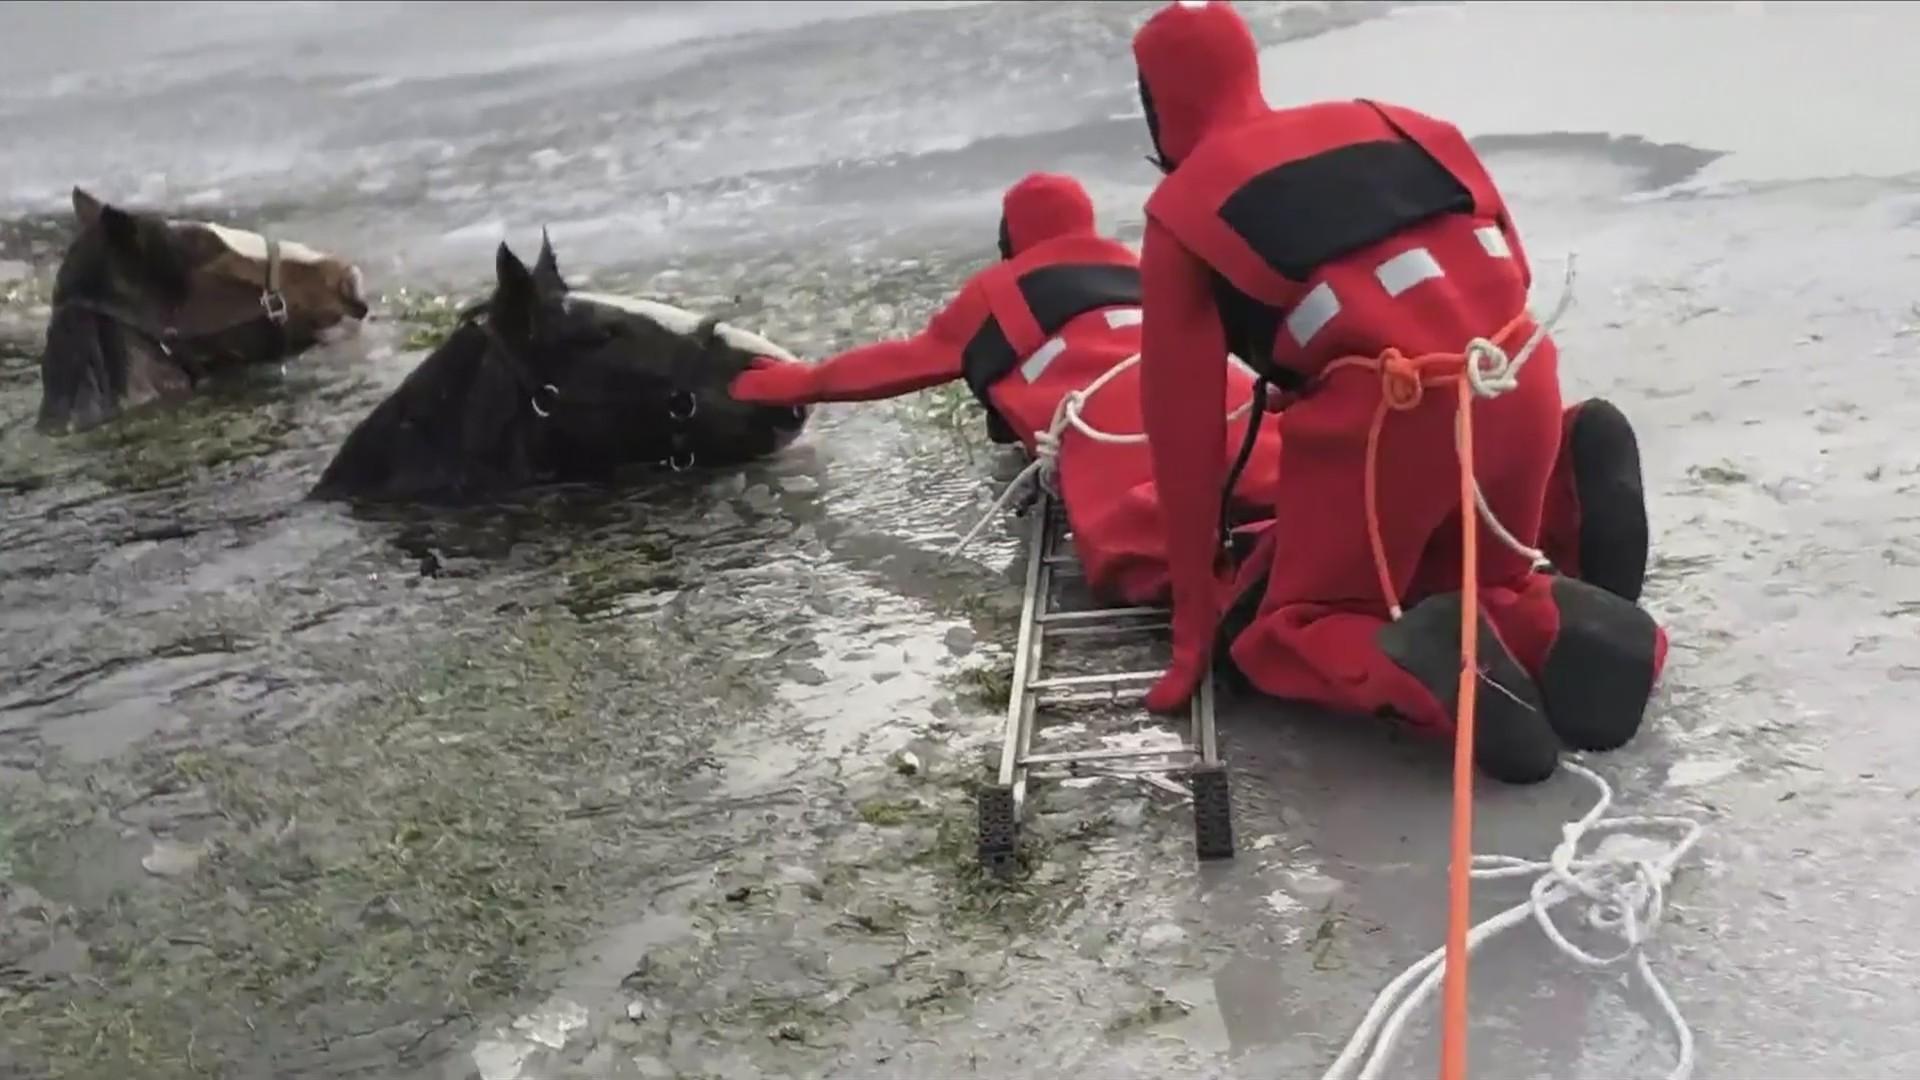 Harrowing horse rescues in icy lake